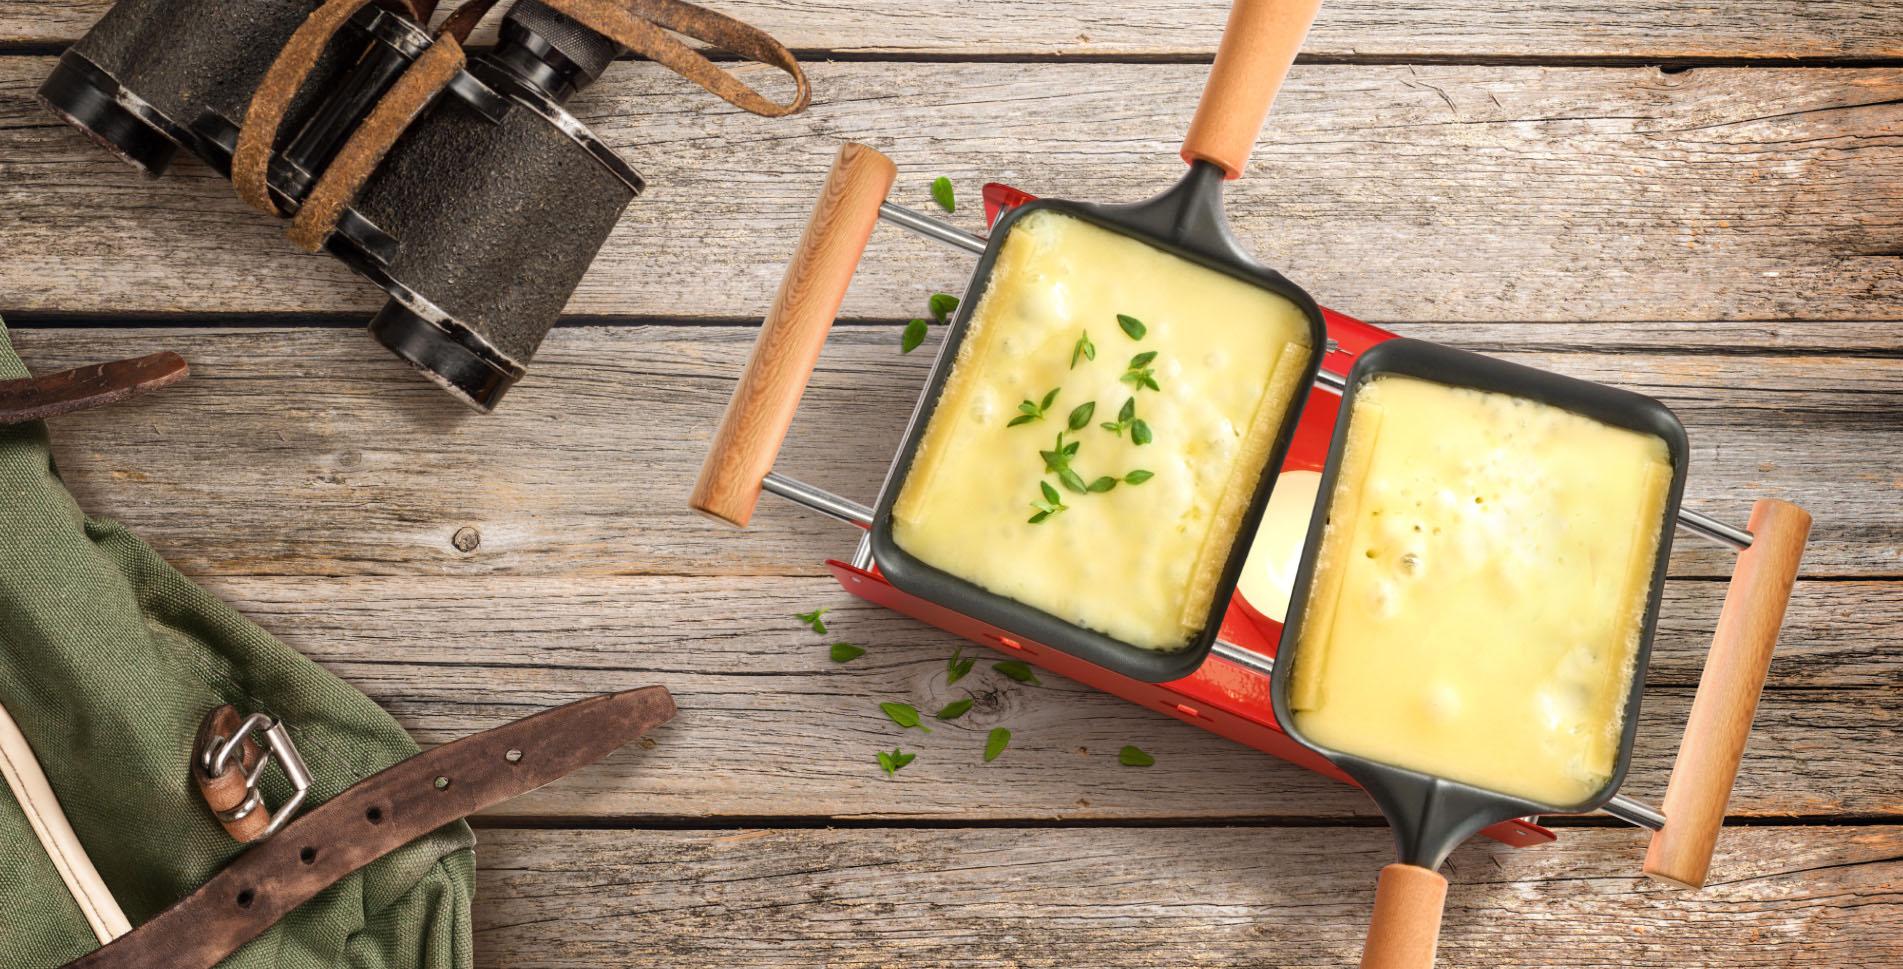 Reaclette-Öfeli von Raclette Suisse – Twiny Cheese